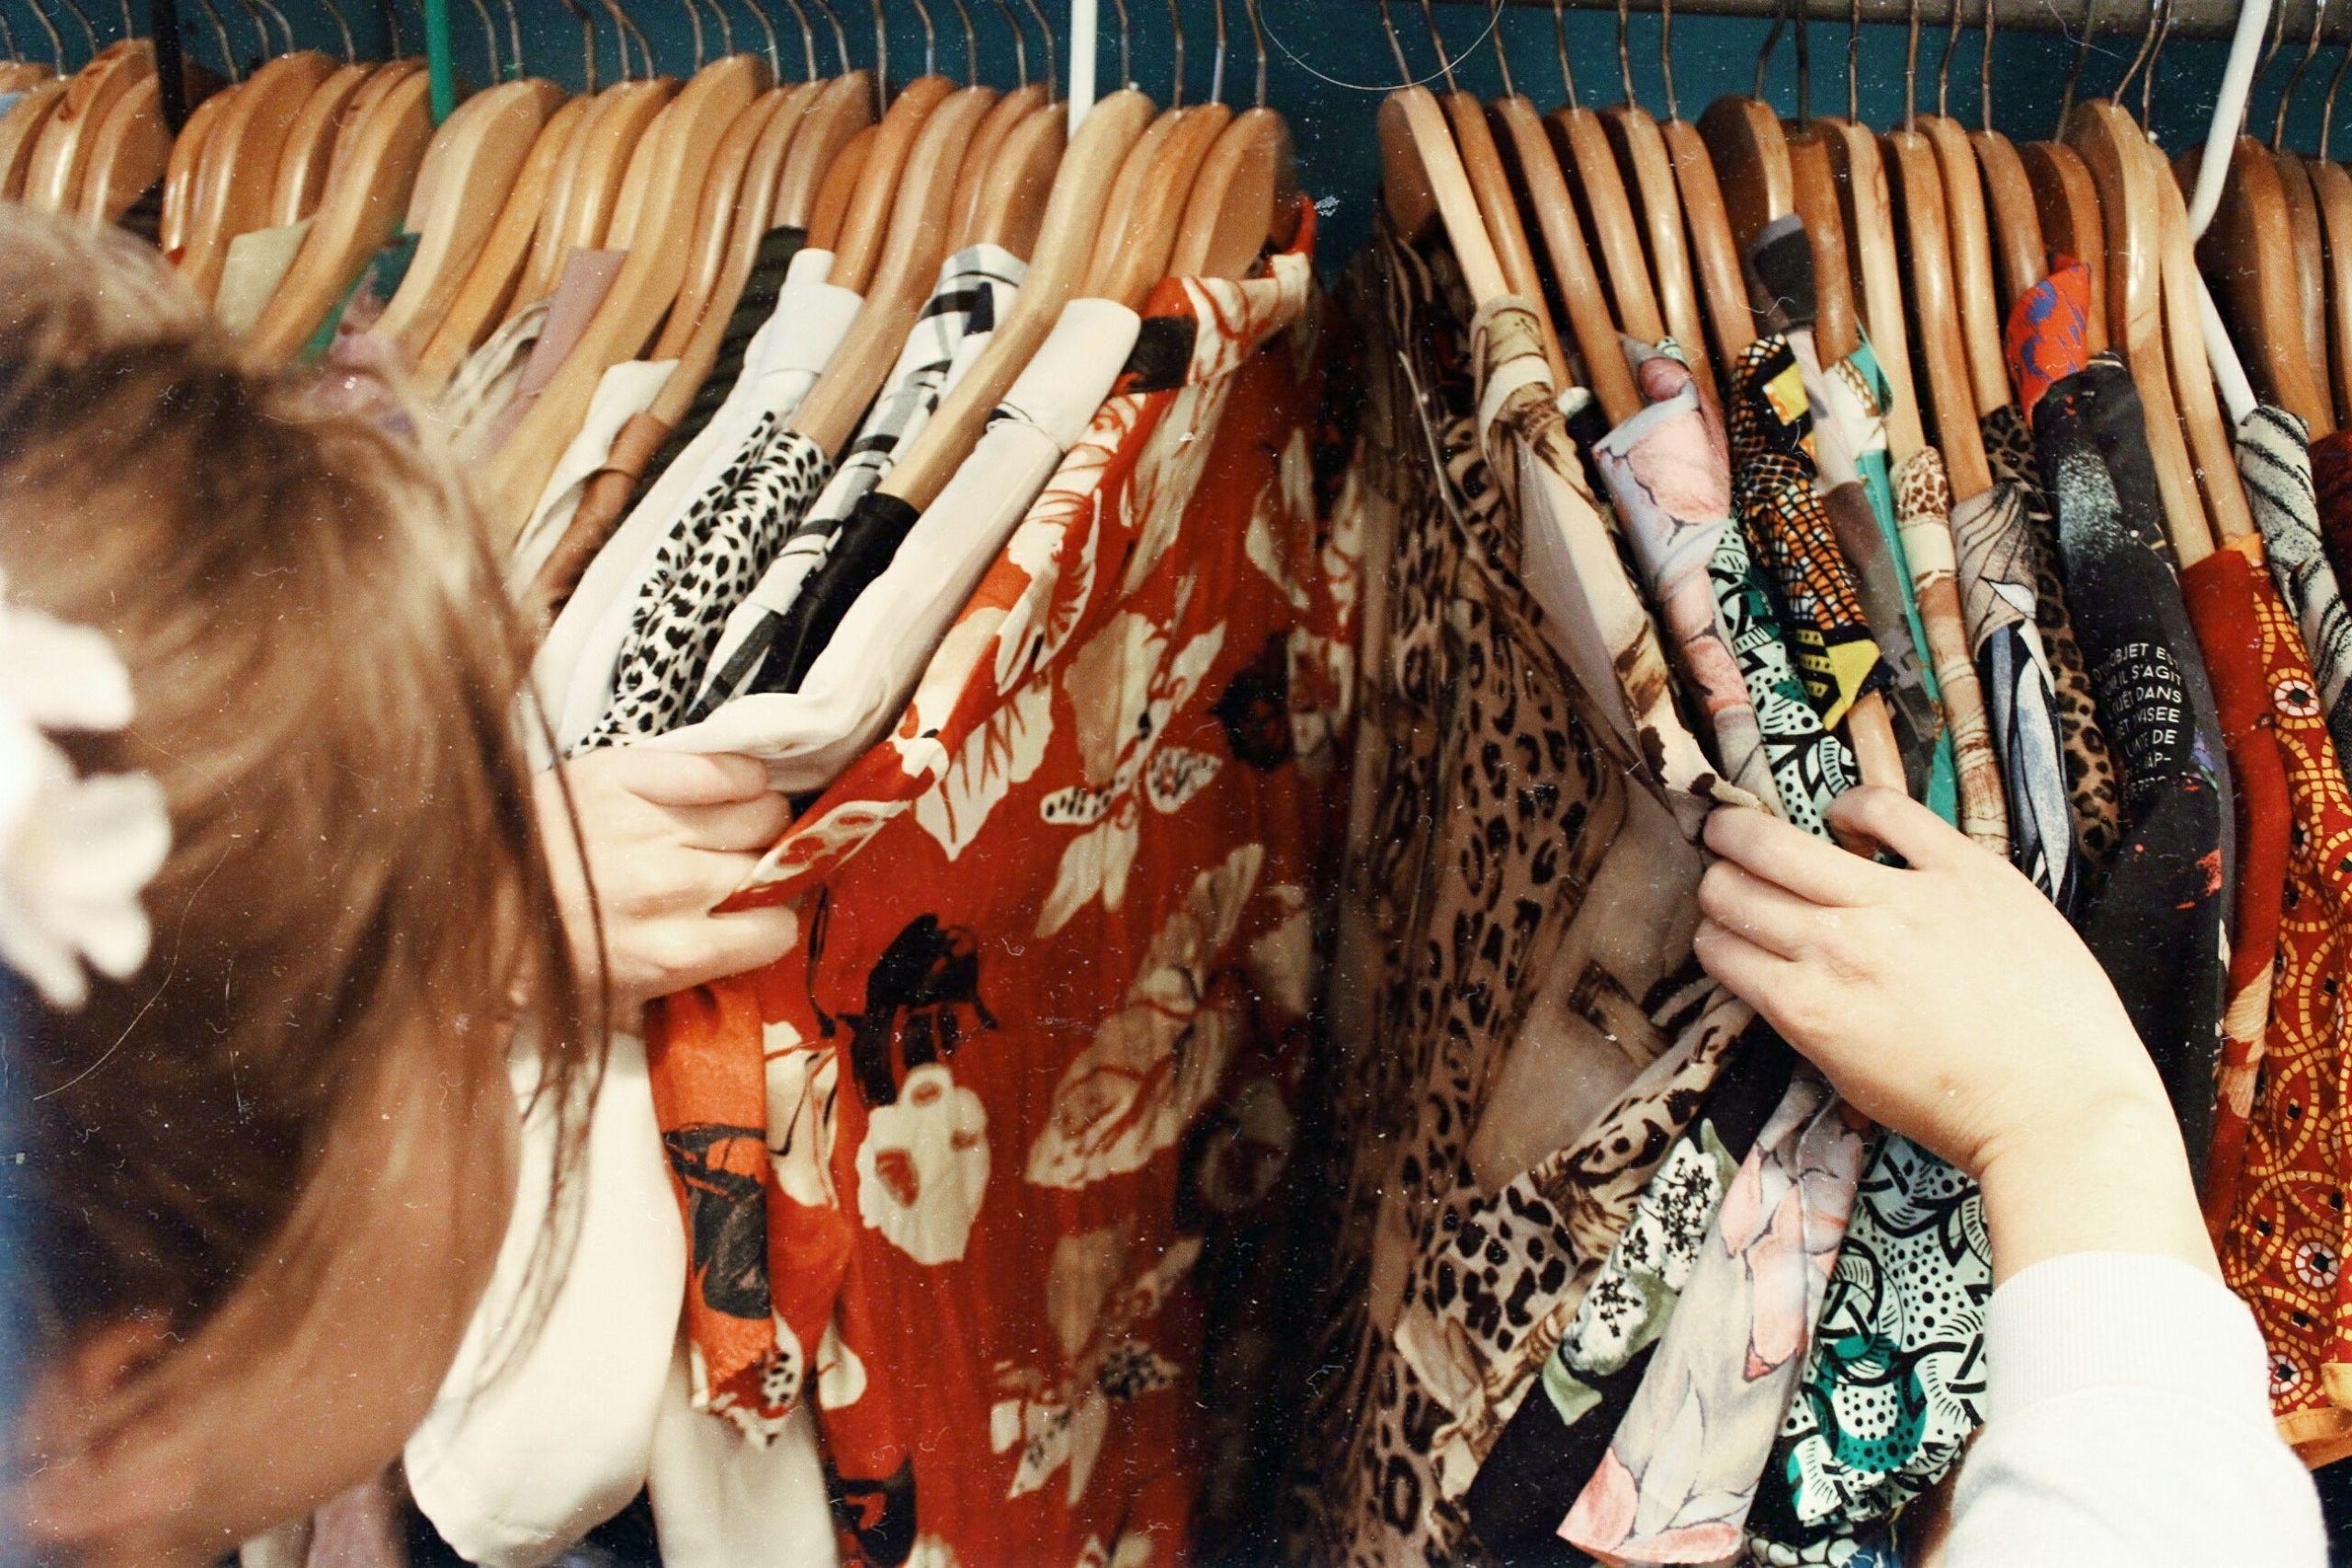 Ny skandinavisk mode: Moves by Minimum til kvinder